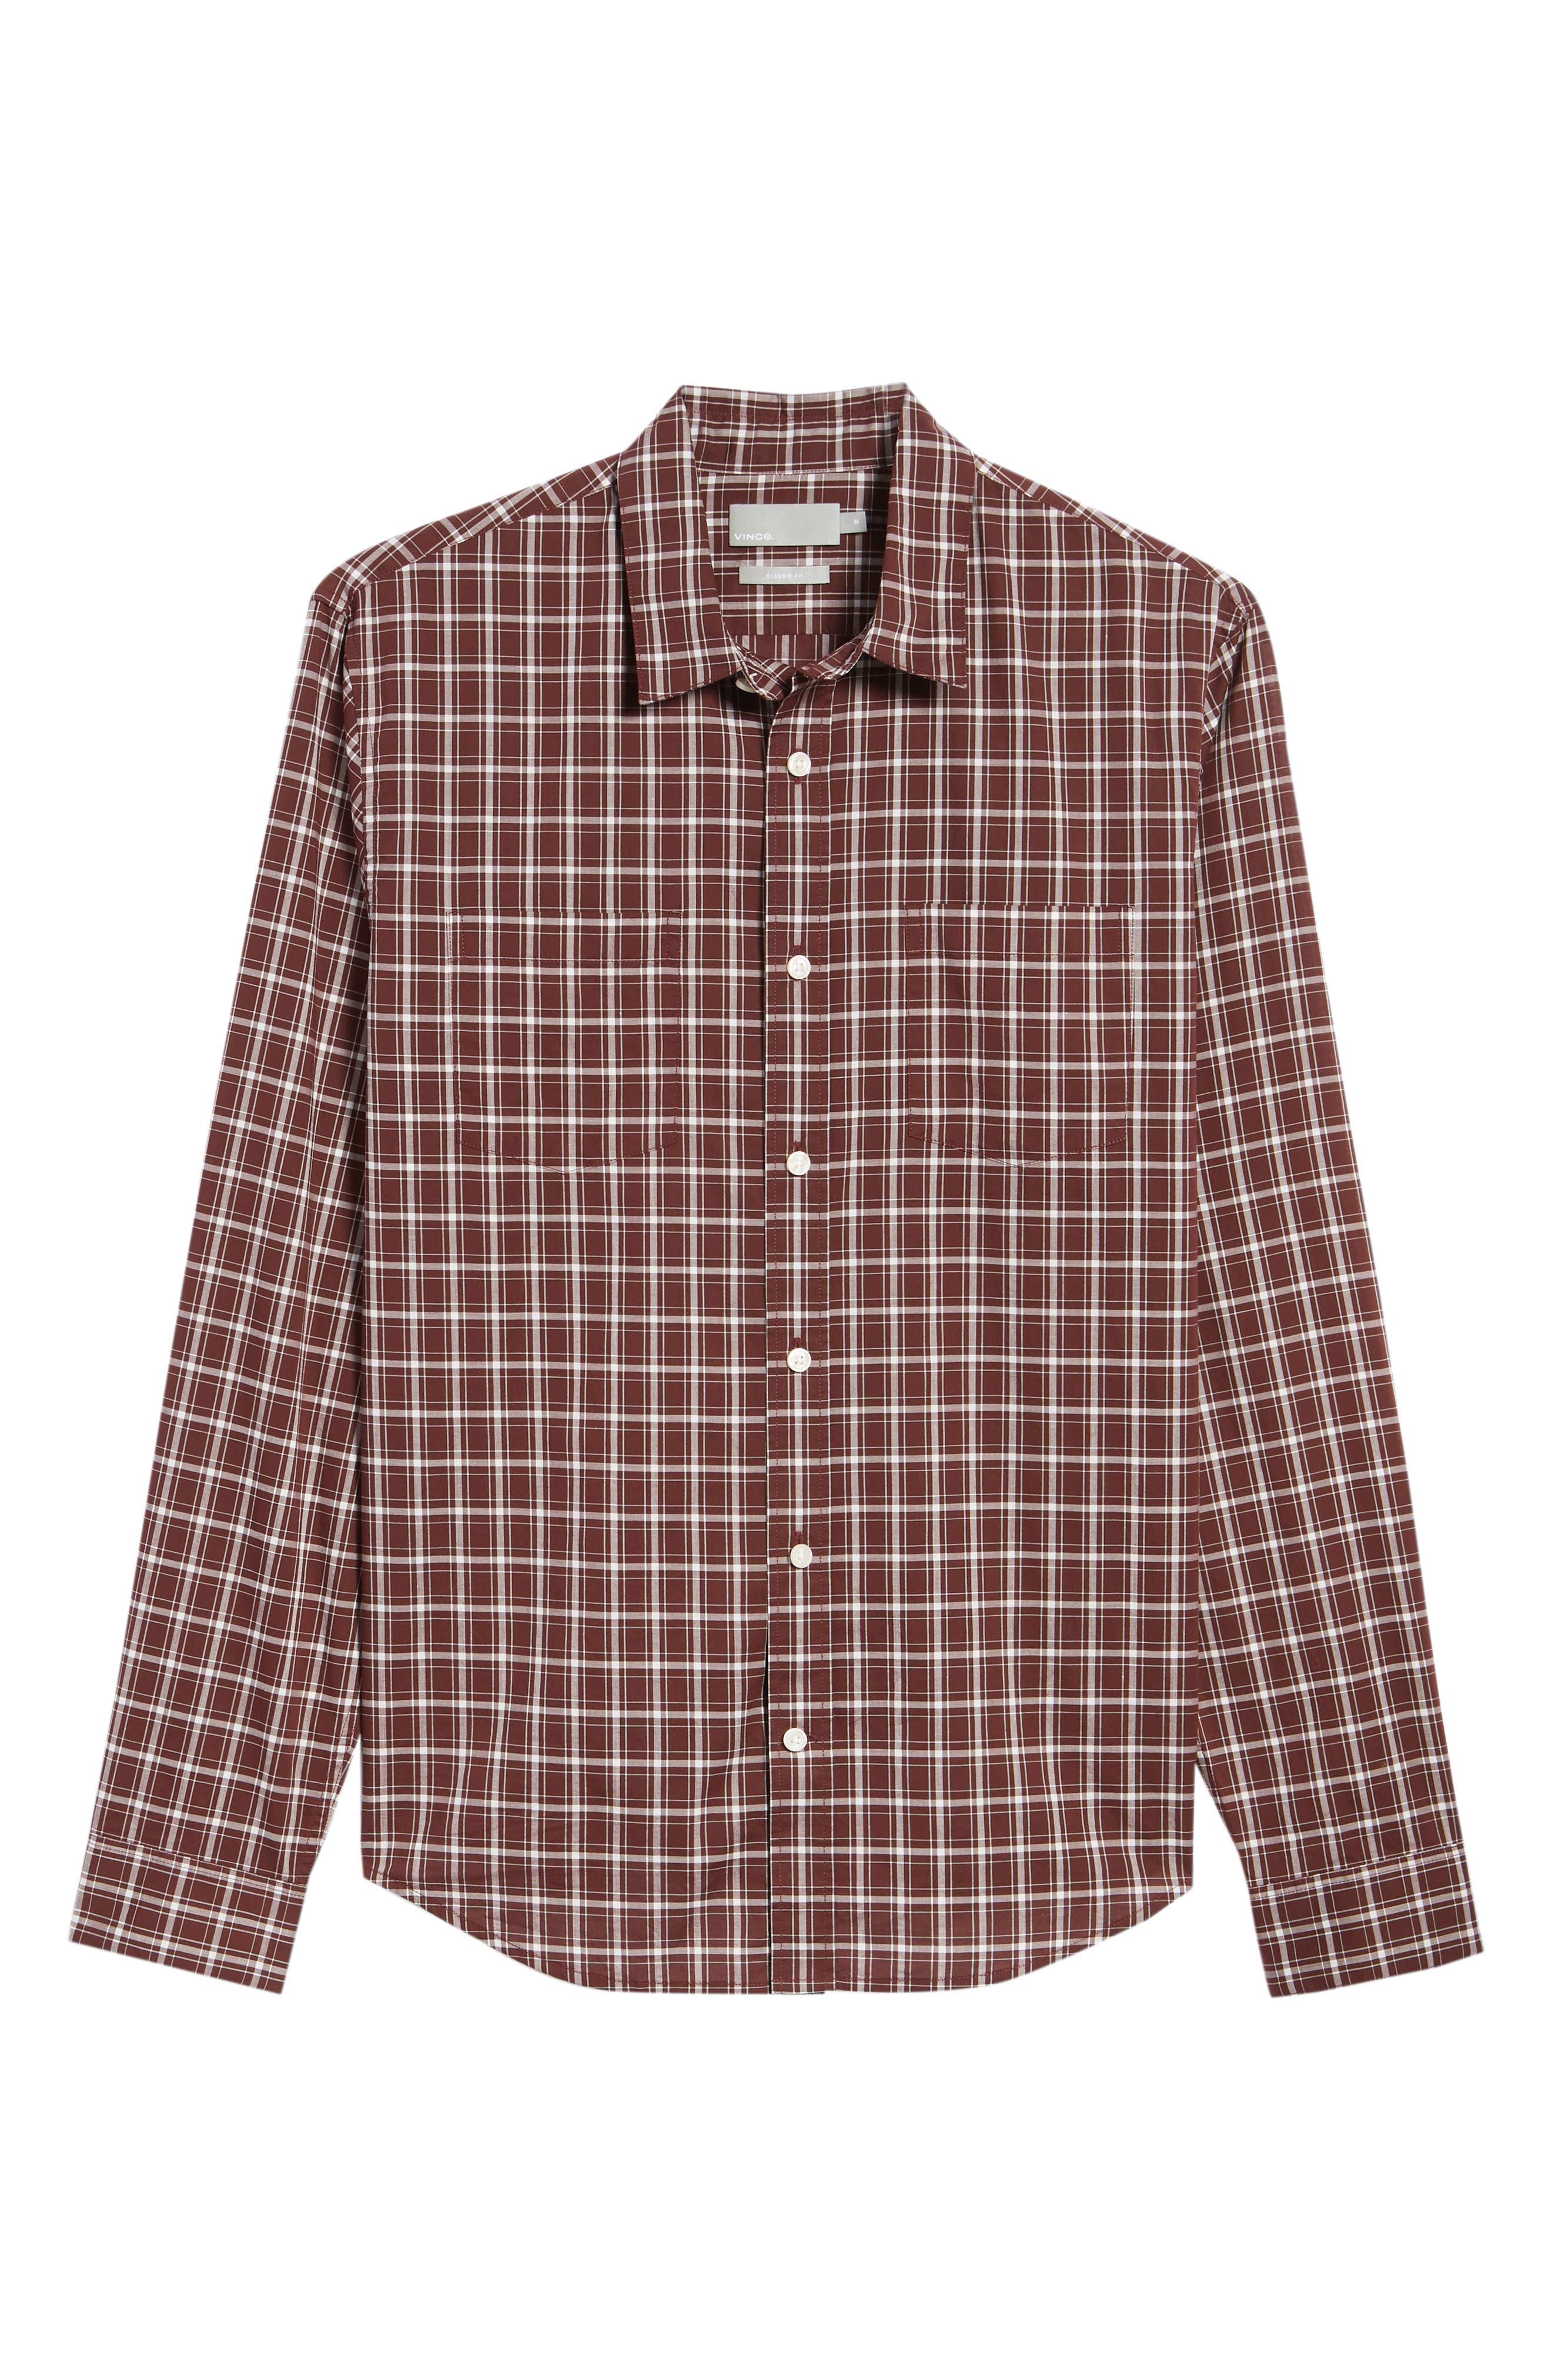 Classic Fit Plaid Sport Shirt,                             Alternate thumbnail 6, color,                             Black Cherry